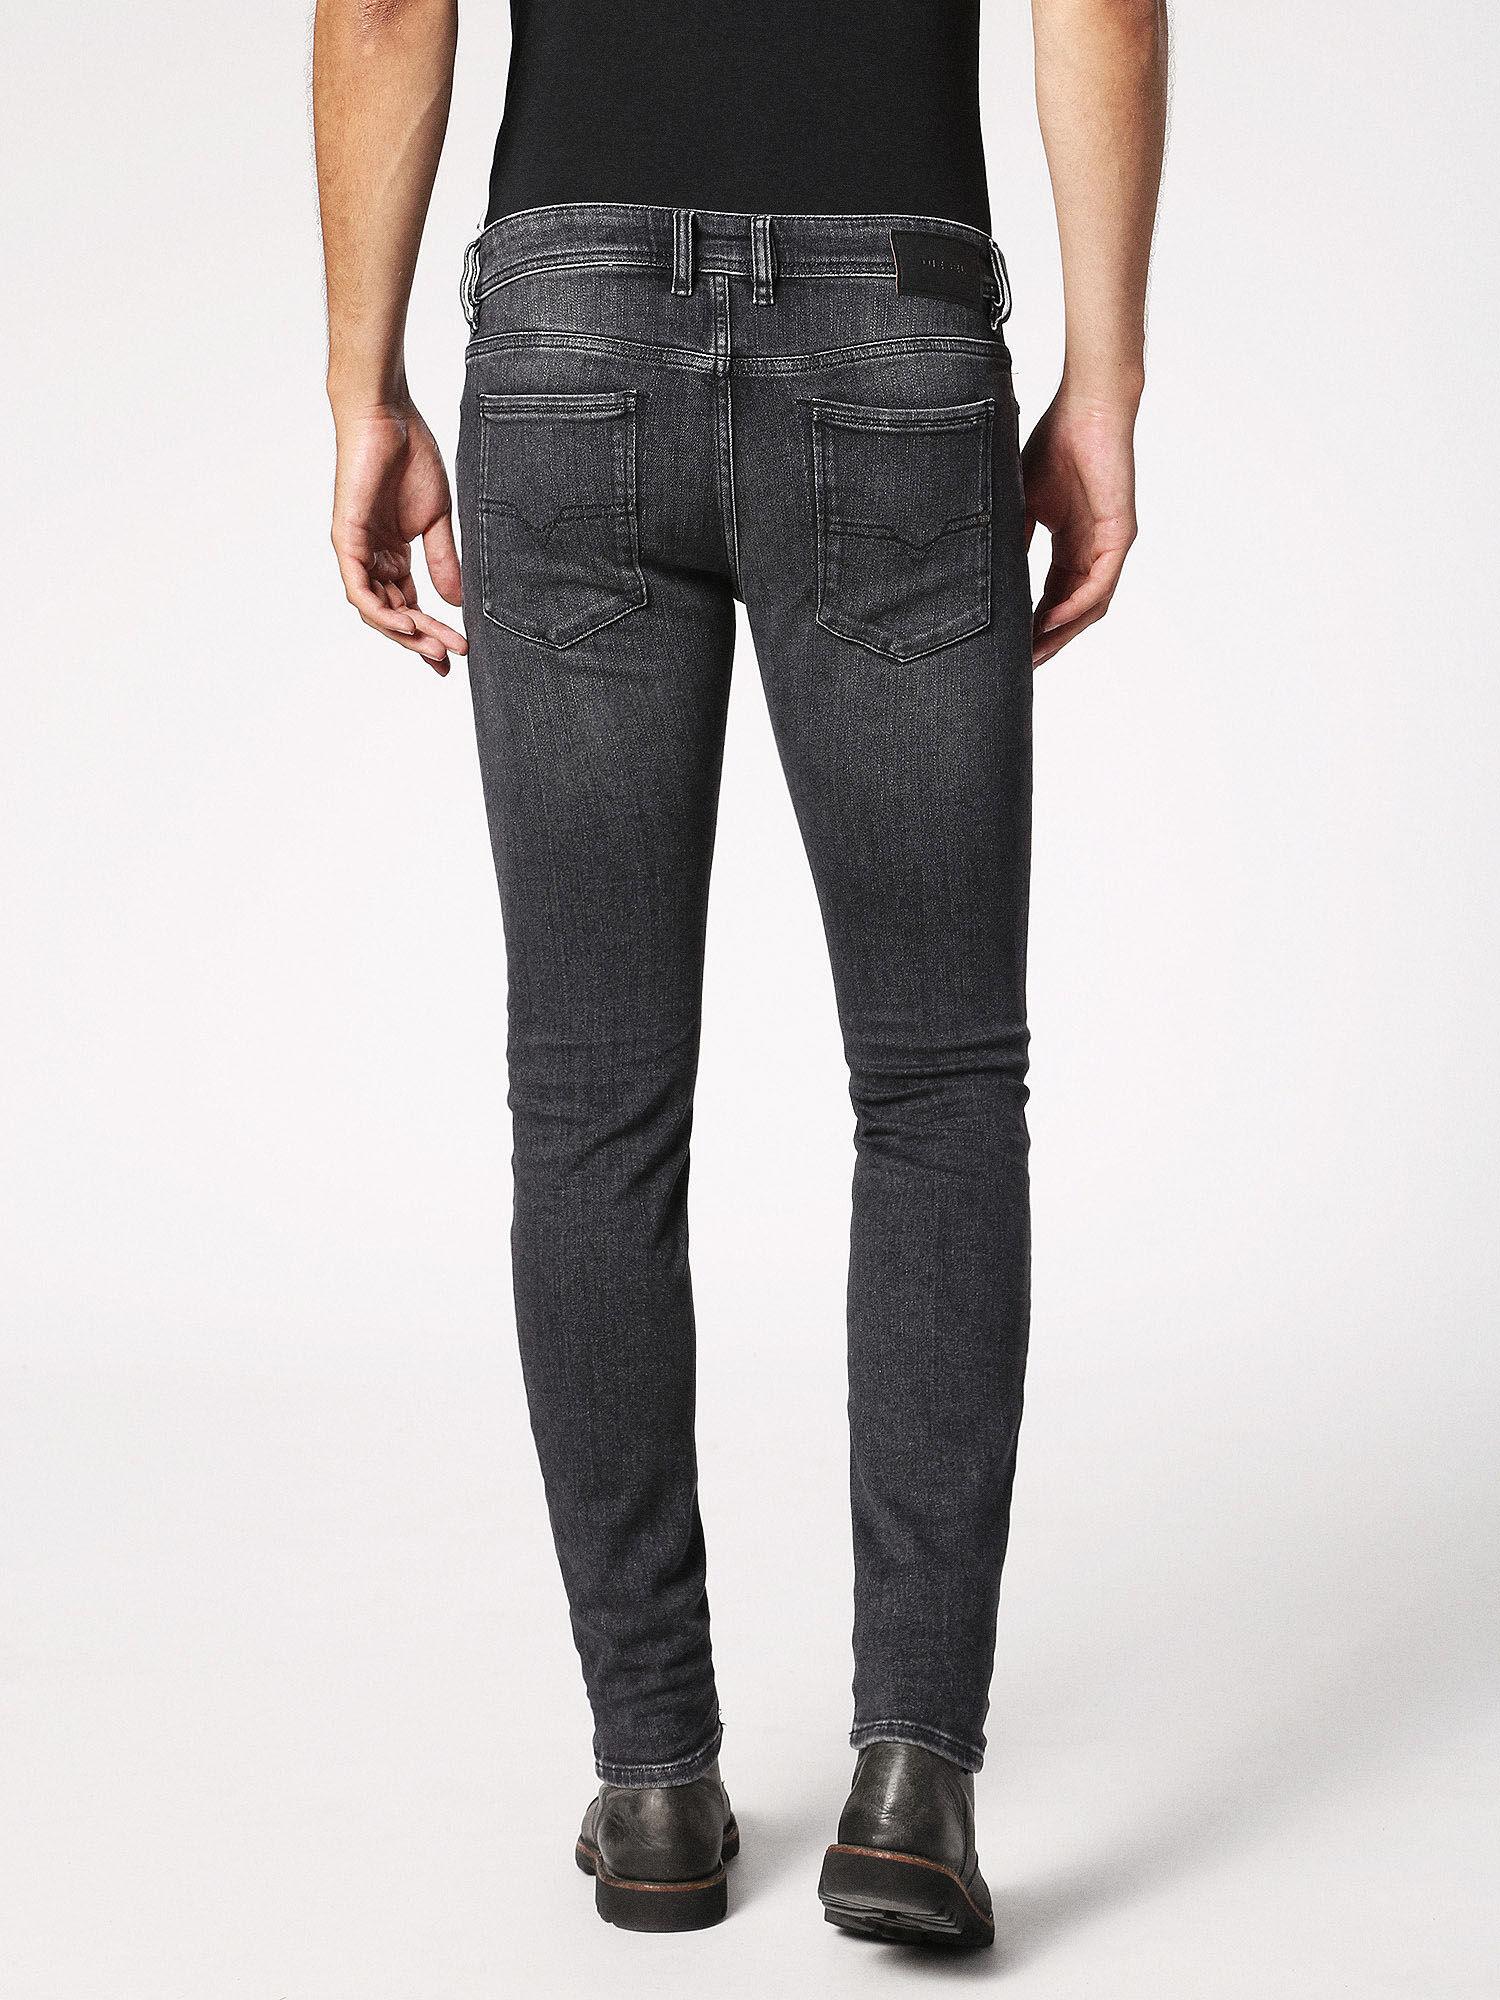 Jeans On Sale in Outlet, Sleenker Skynny, Grey, Cotton, 2017, 30 33 Diesel